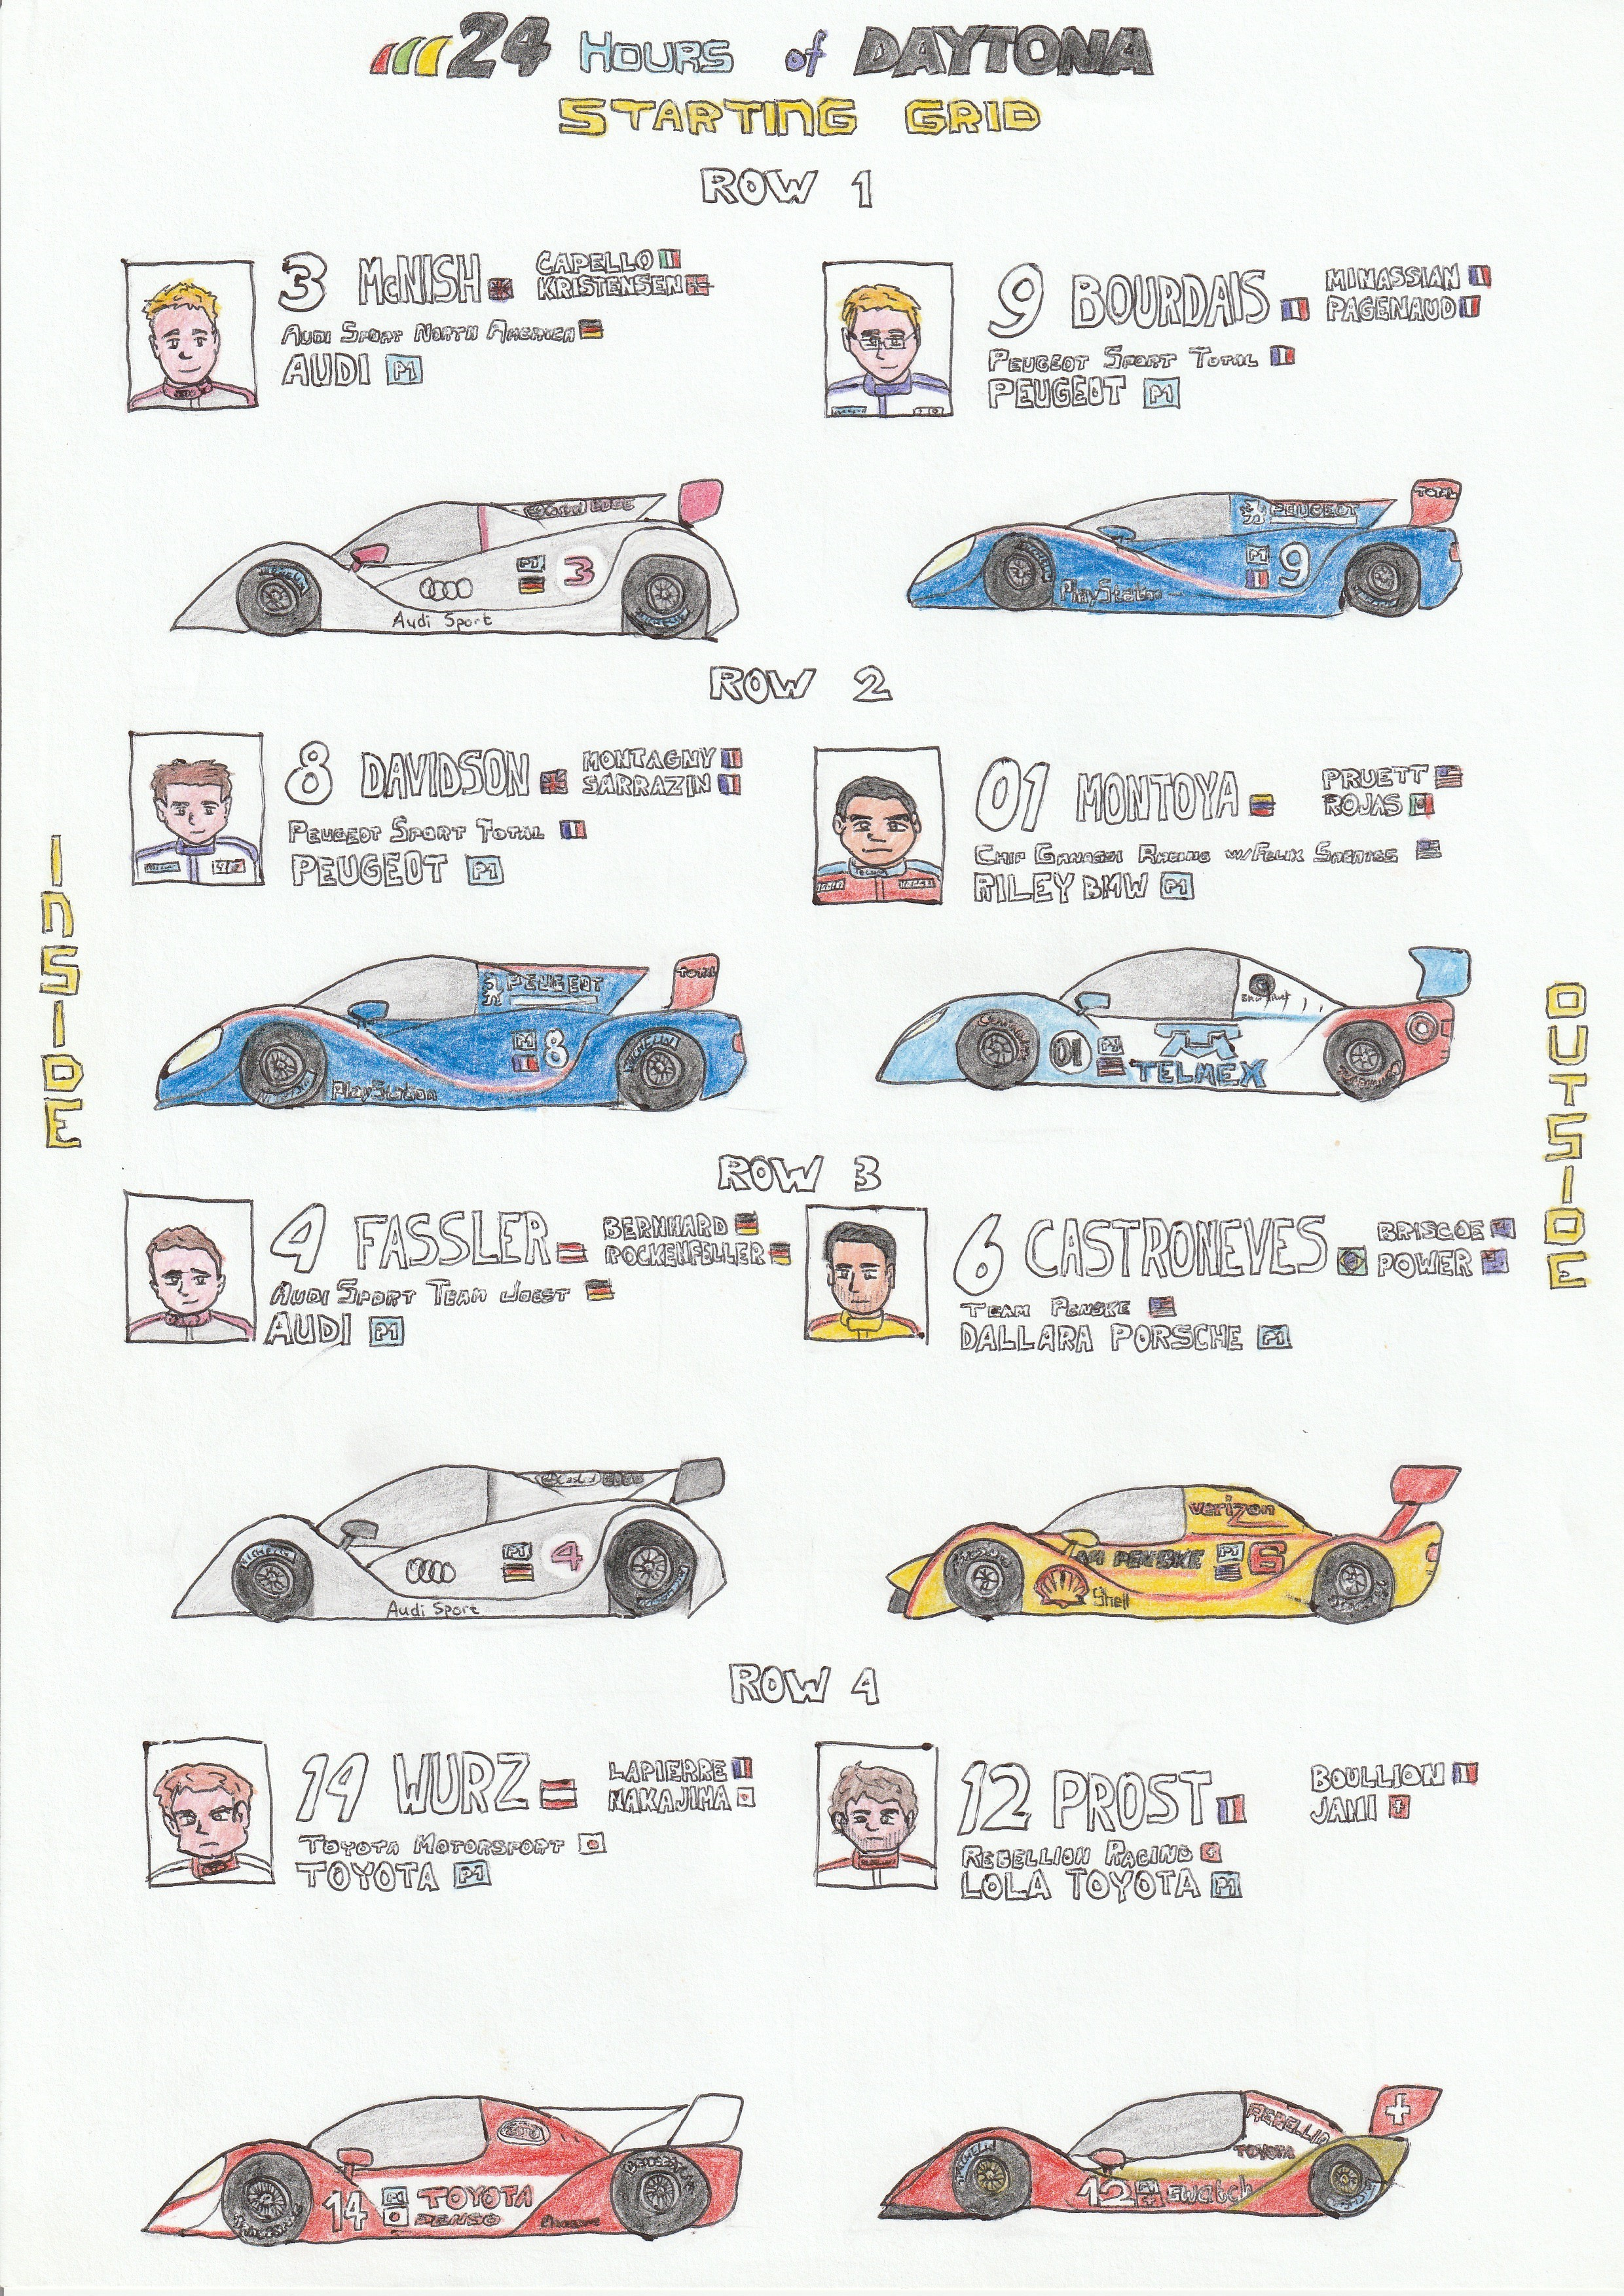 Onscreen      graphic for Daytona 24-hour race (starting grid)